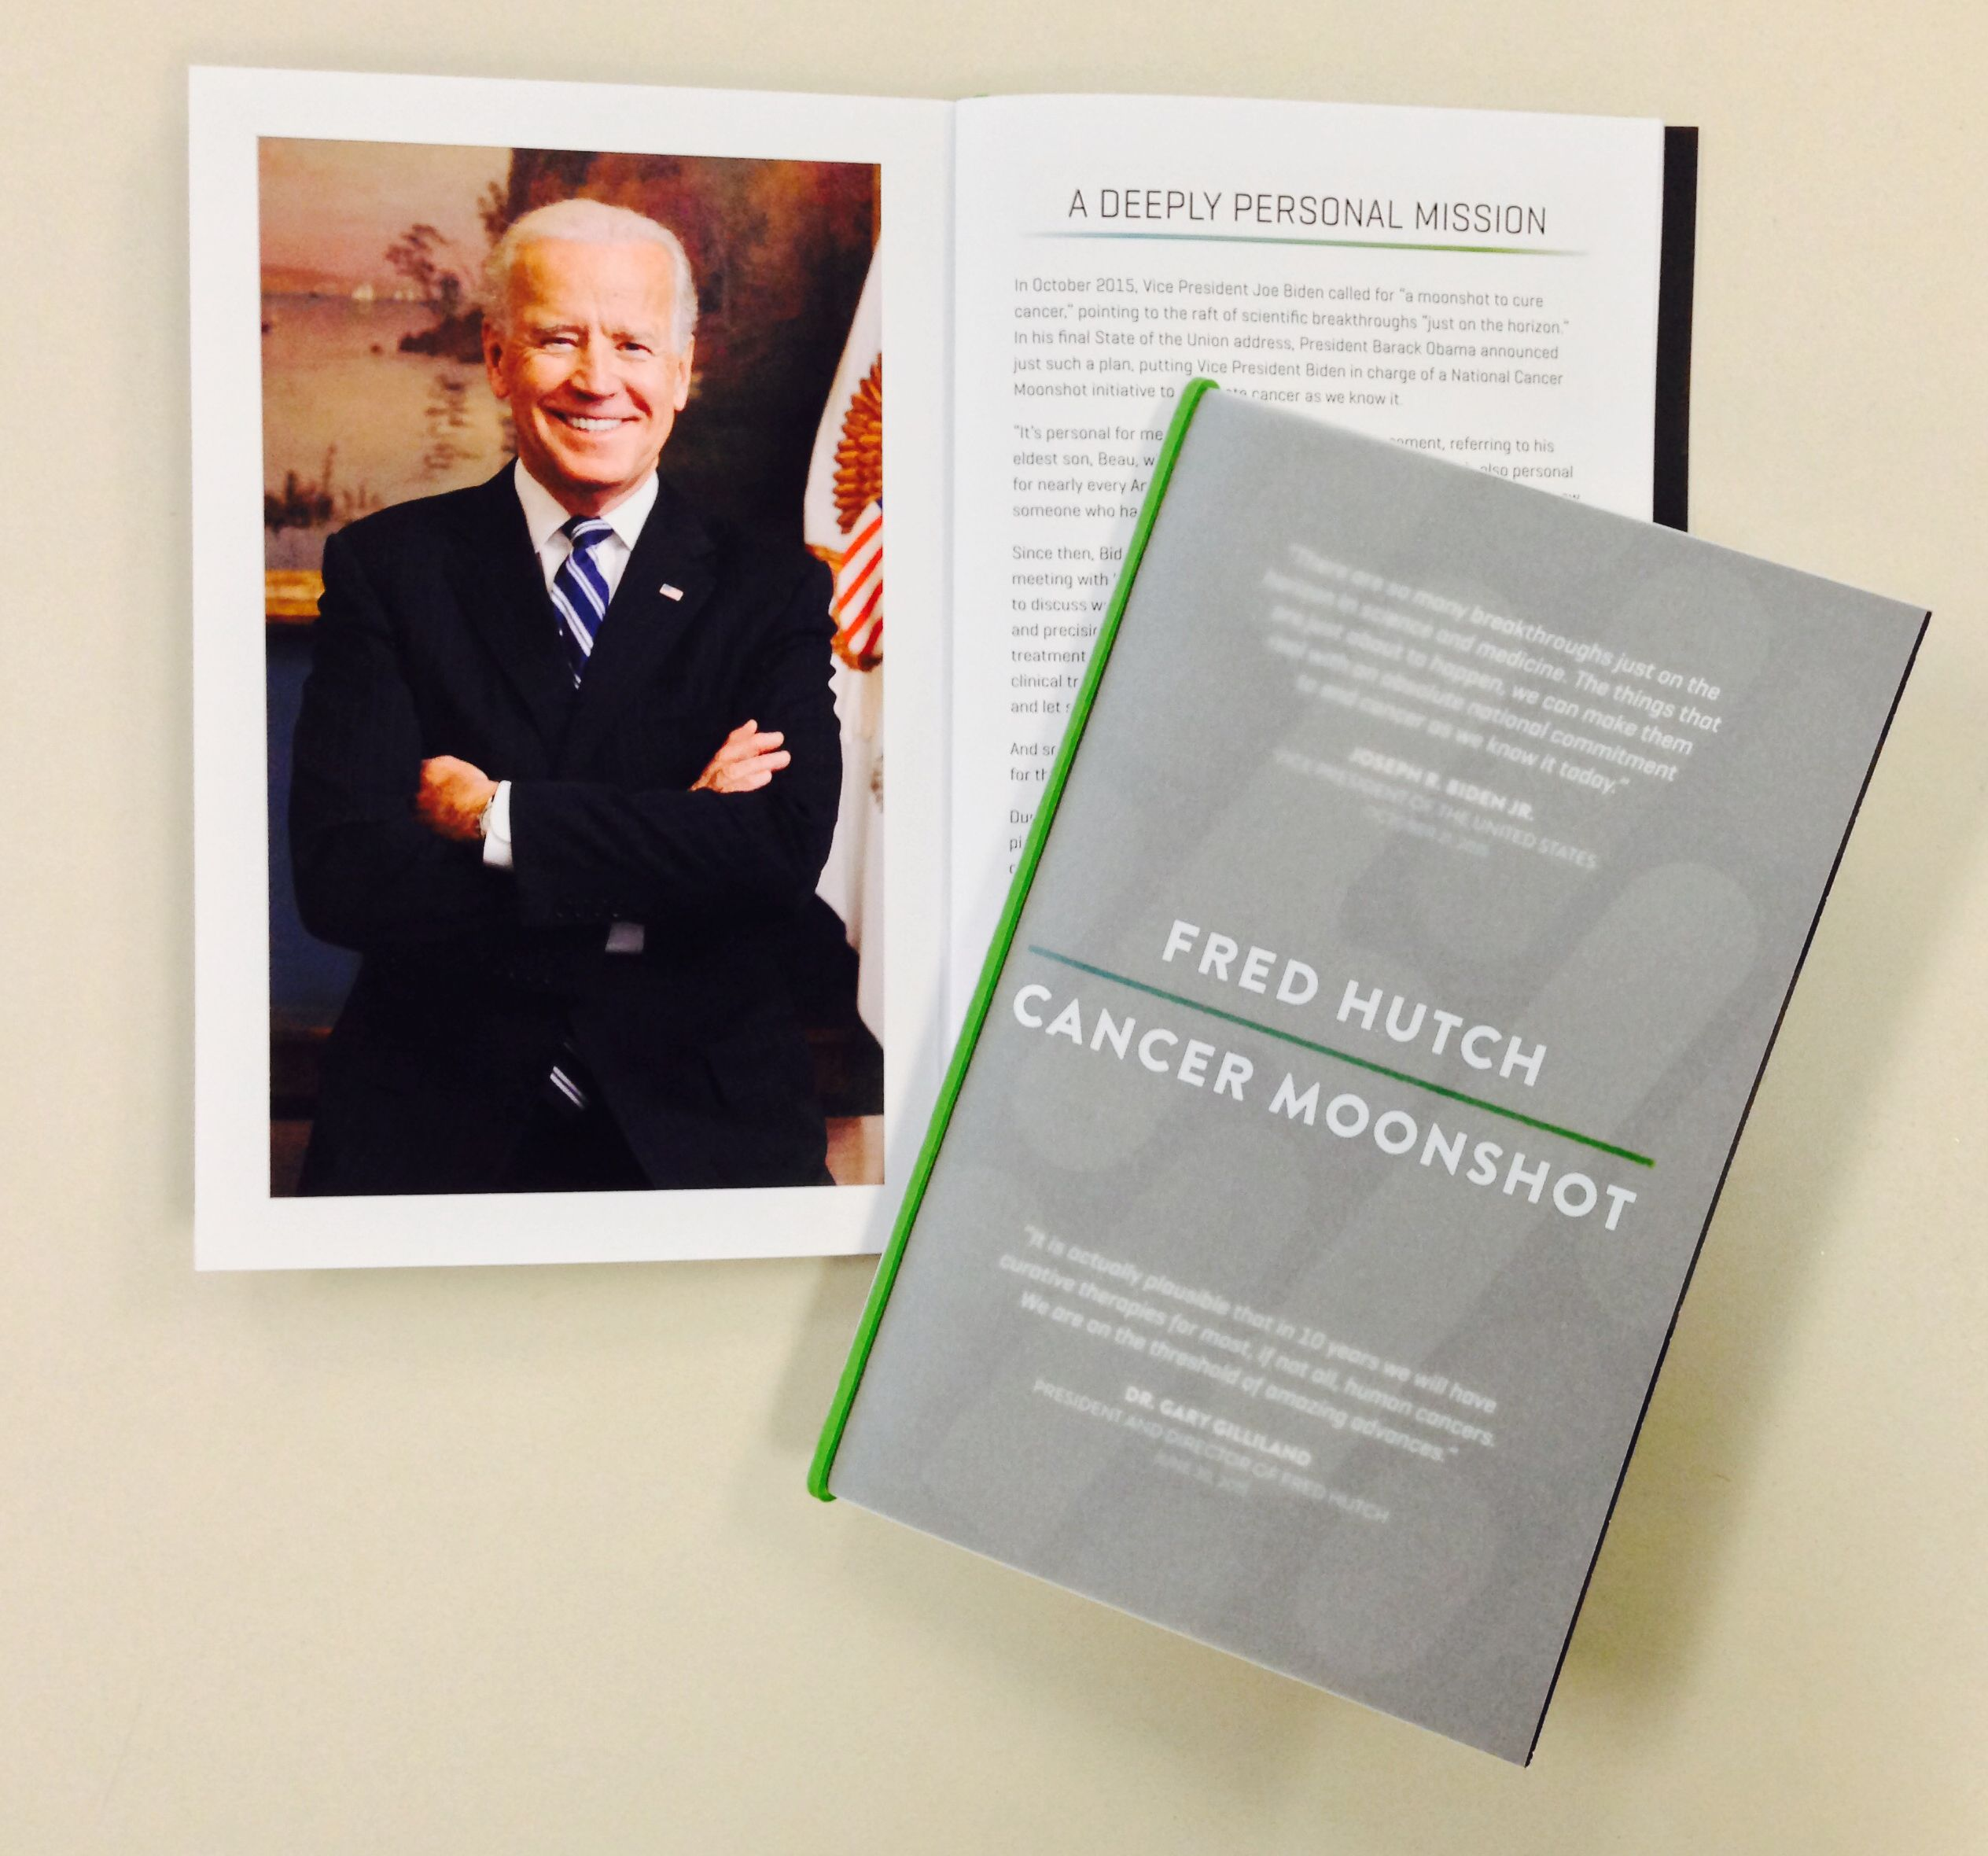 Vice President Joe Biden visits Fred HutchMoonshot